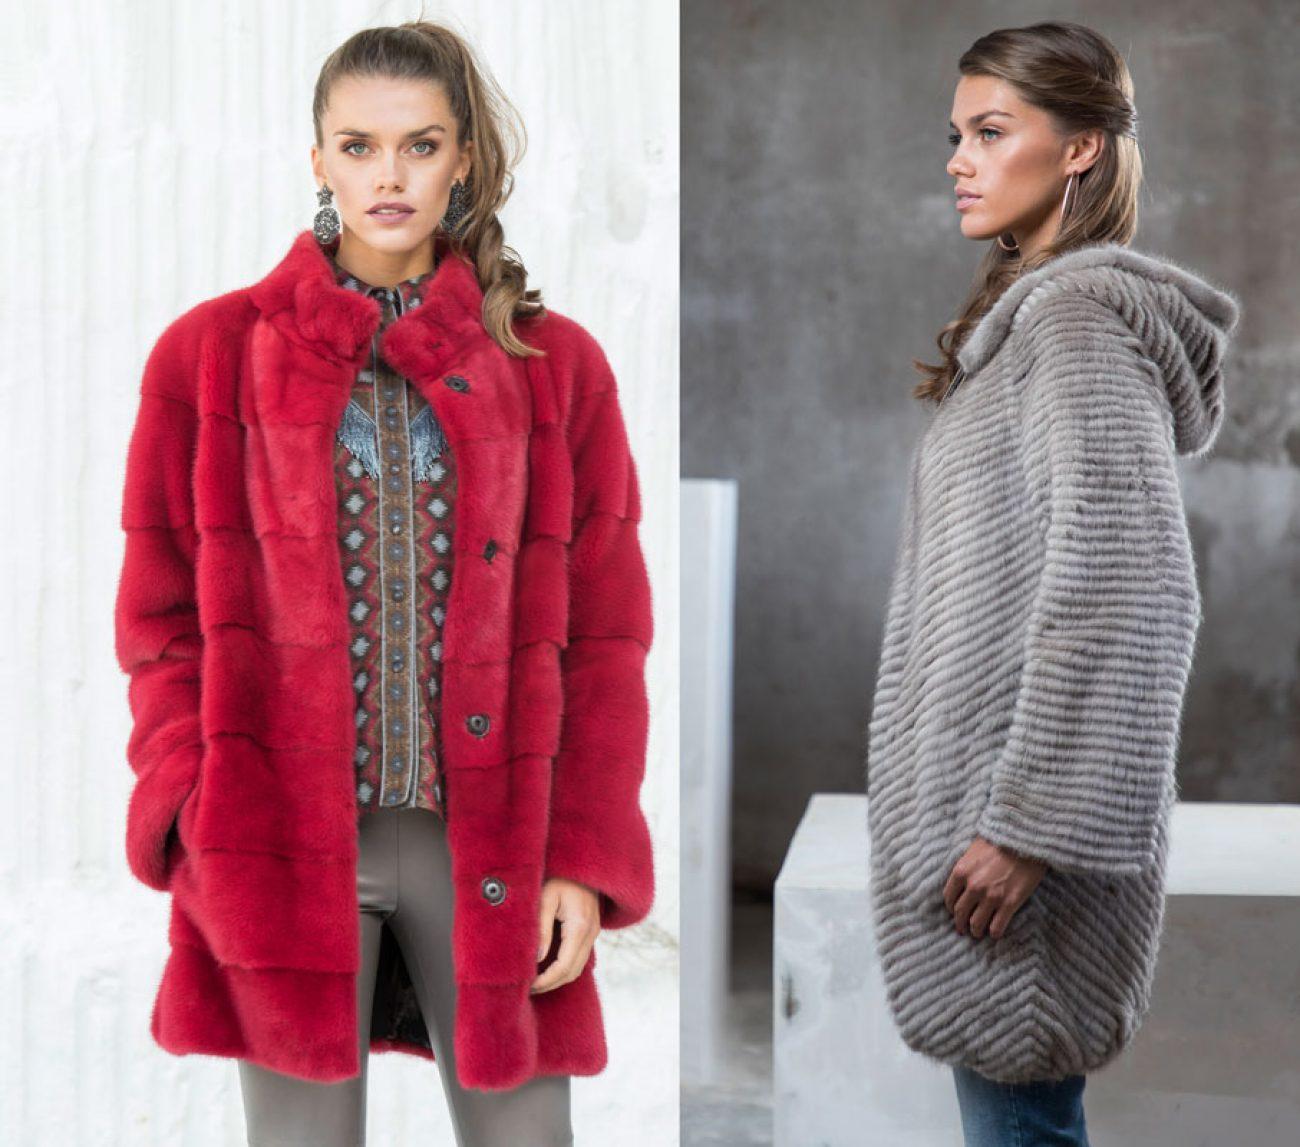 Salzburg Guide Shopping - Furs for Less